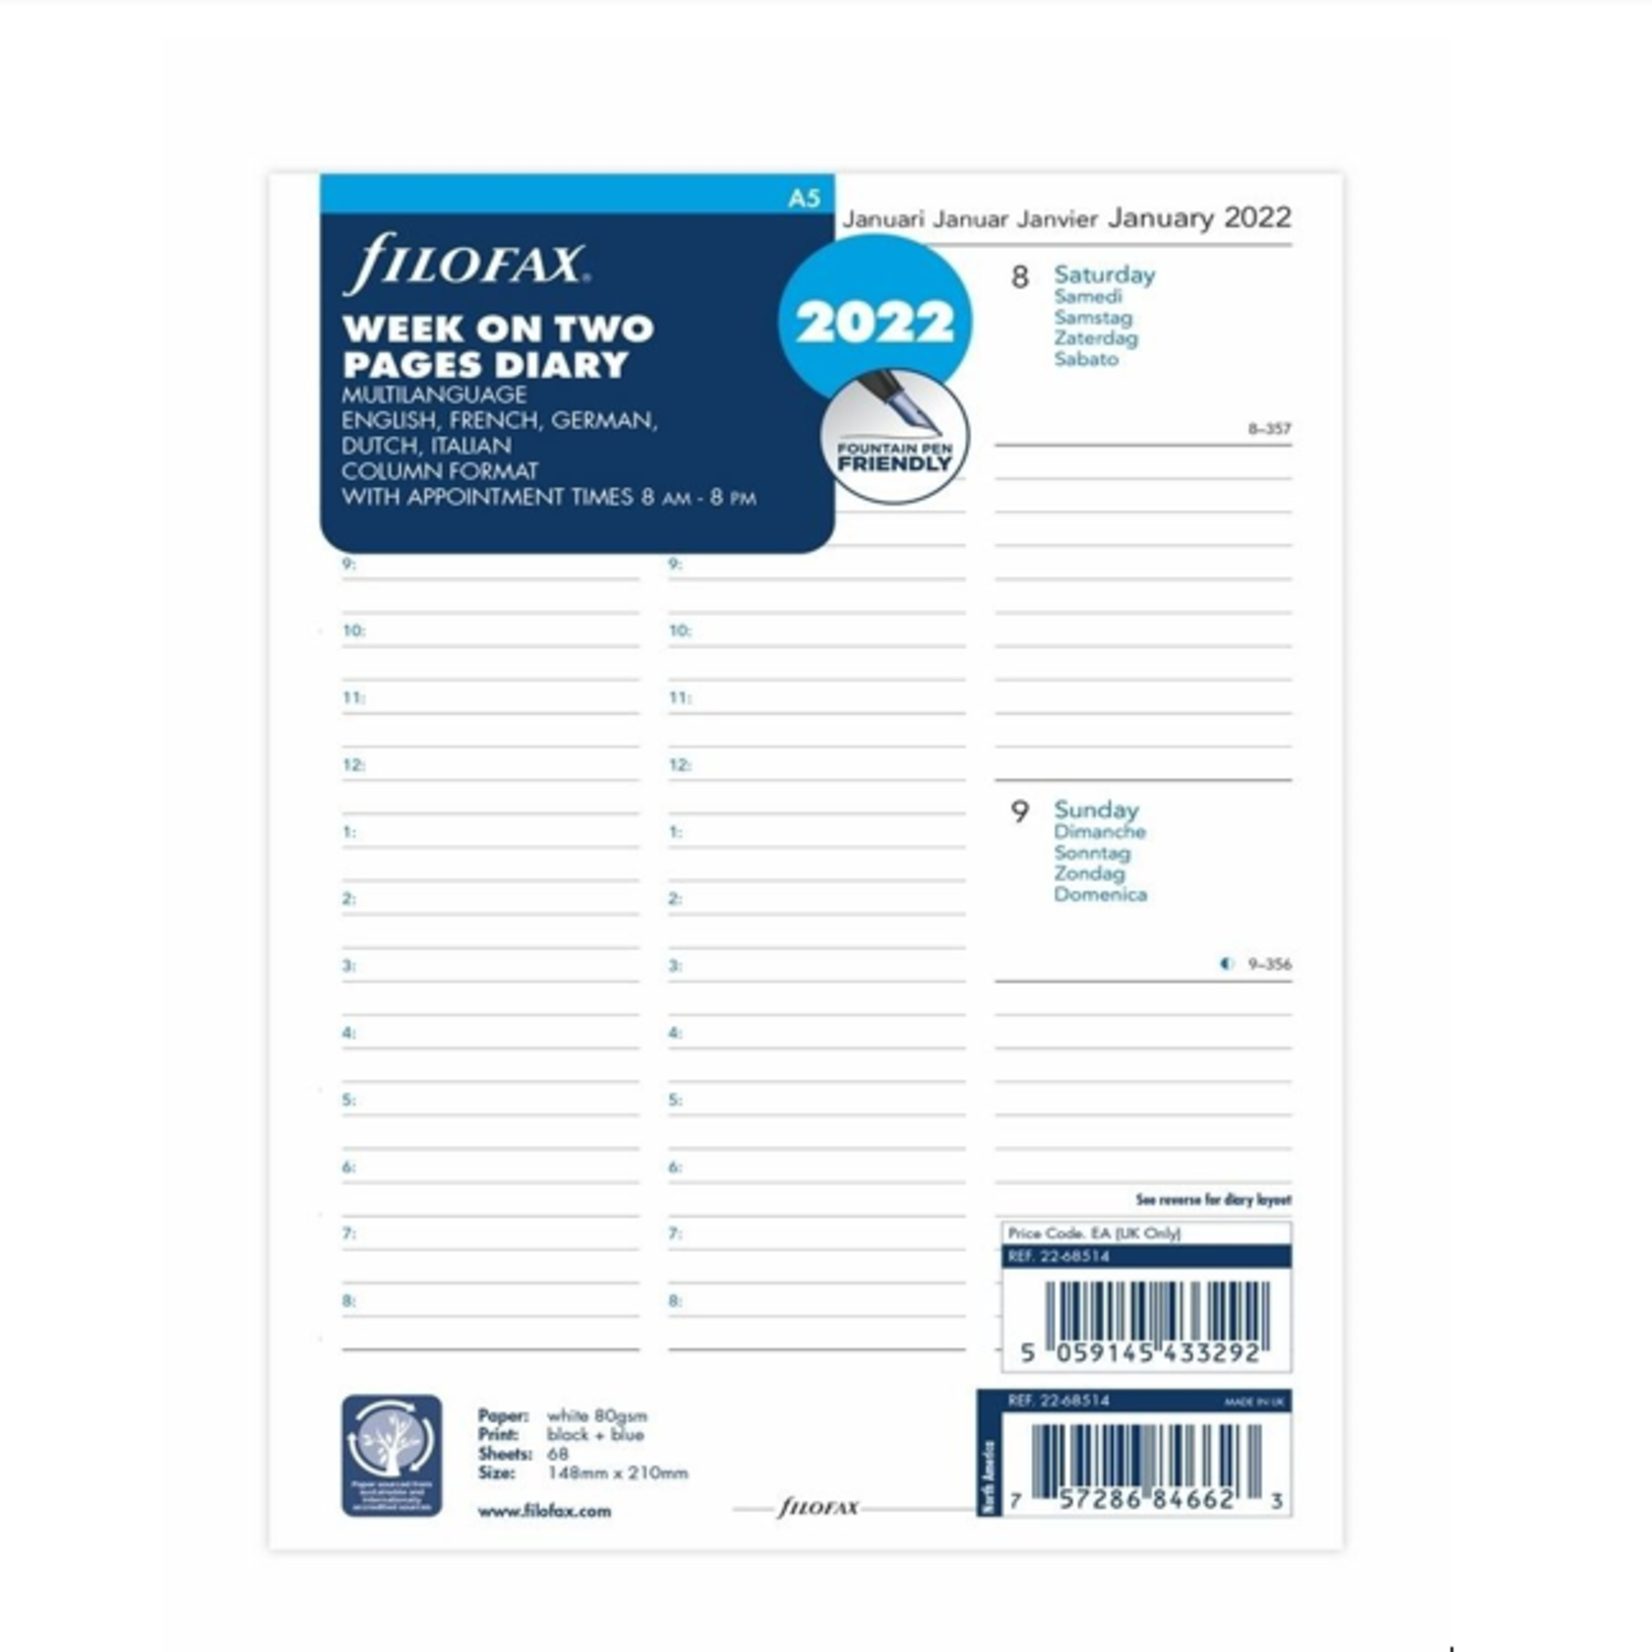 Filofax A5 1W/2S m.Not(M)2022